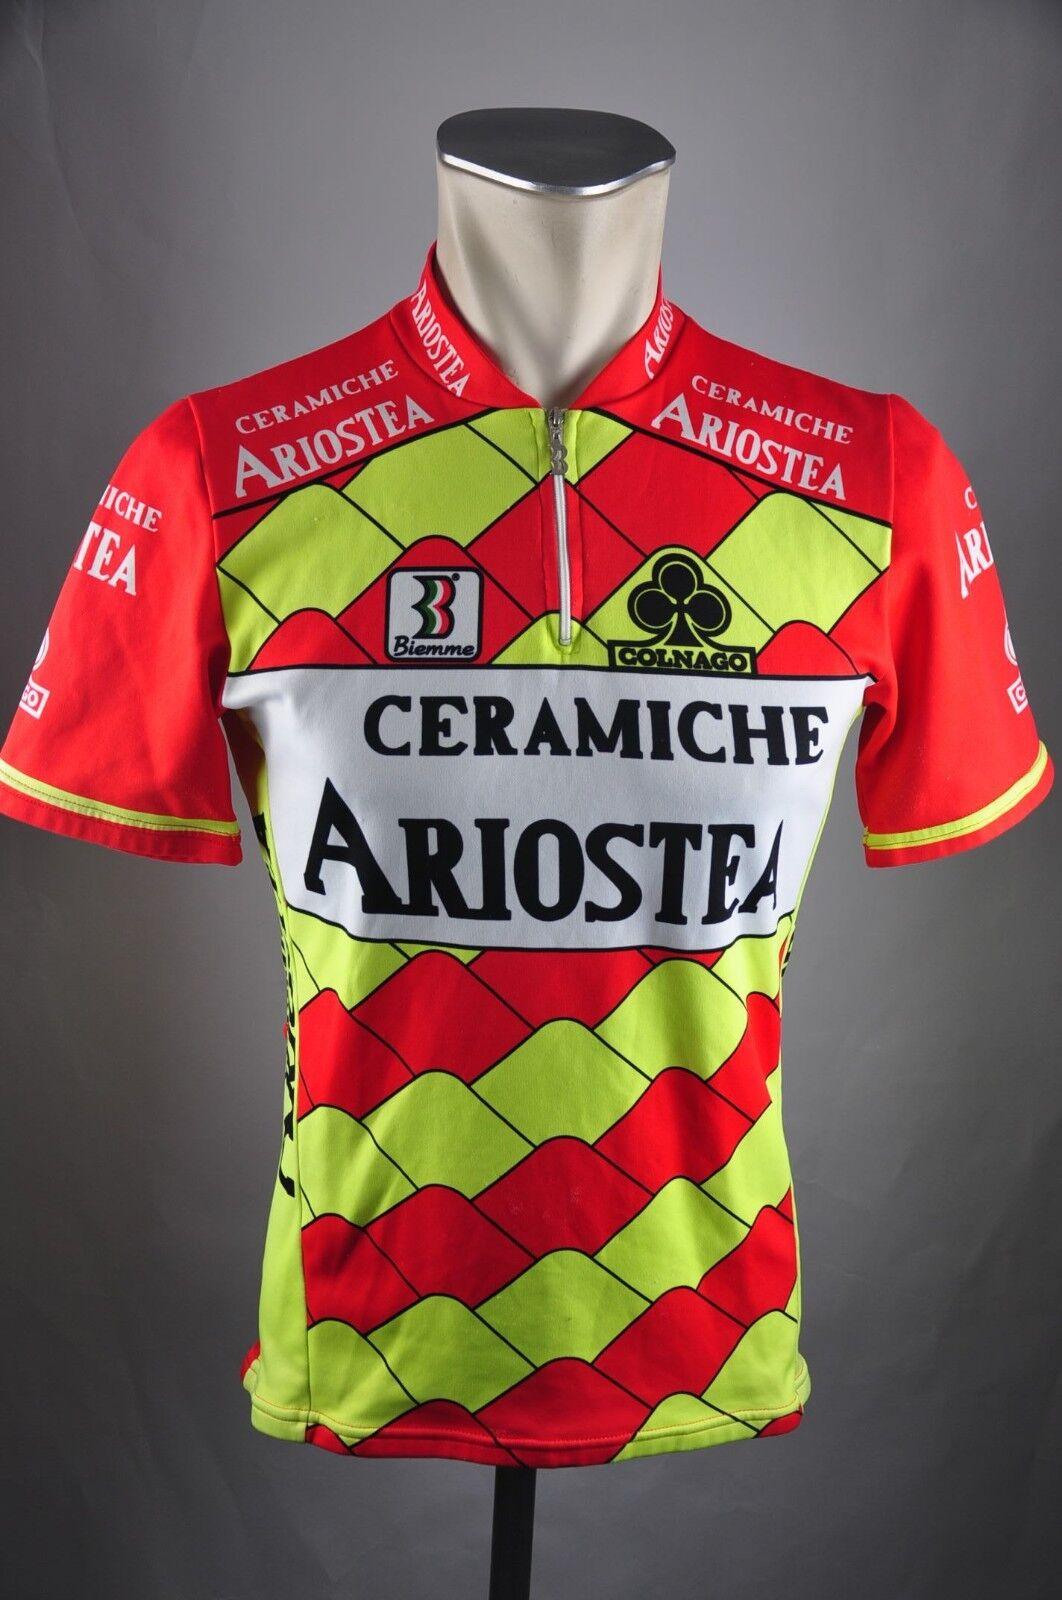 Ceramiche Ariostea Biemme Rad Trikot Gr. S BW 49cm Bike cycling jersey Shirt FZ1